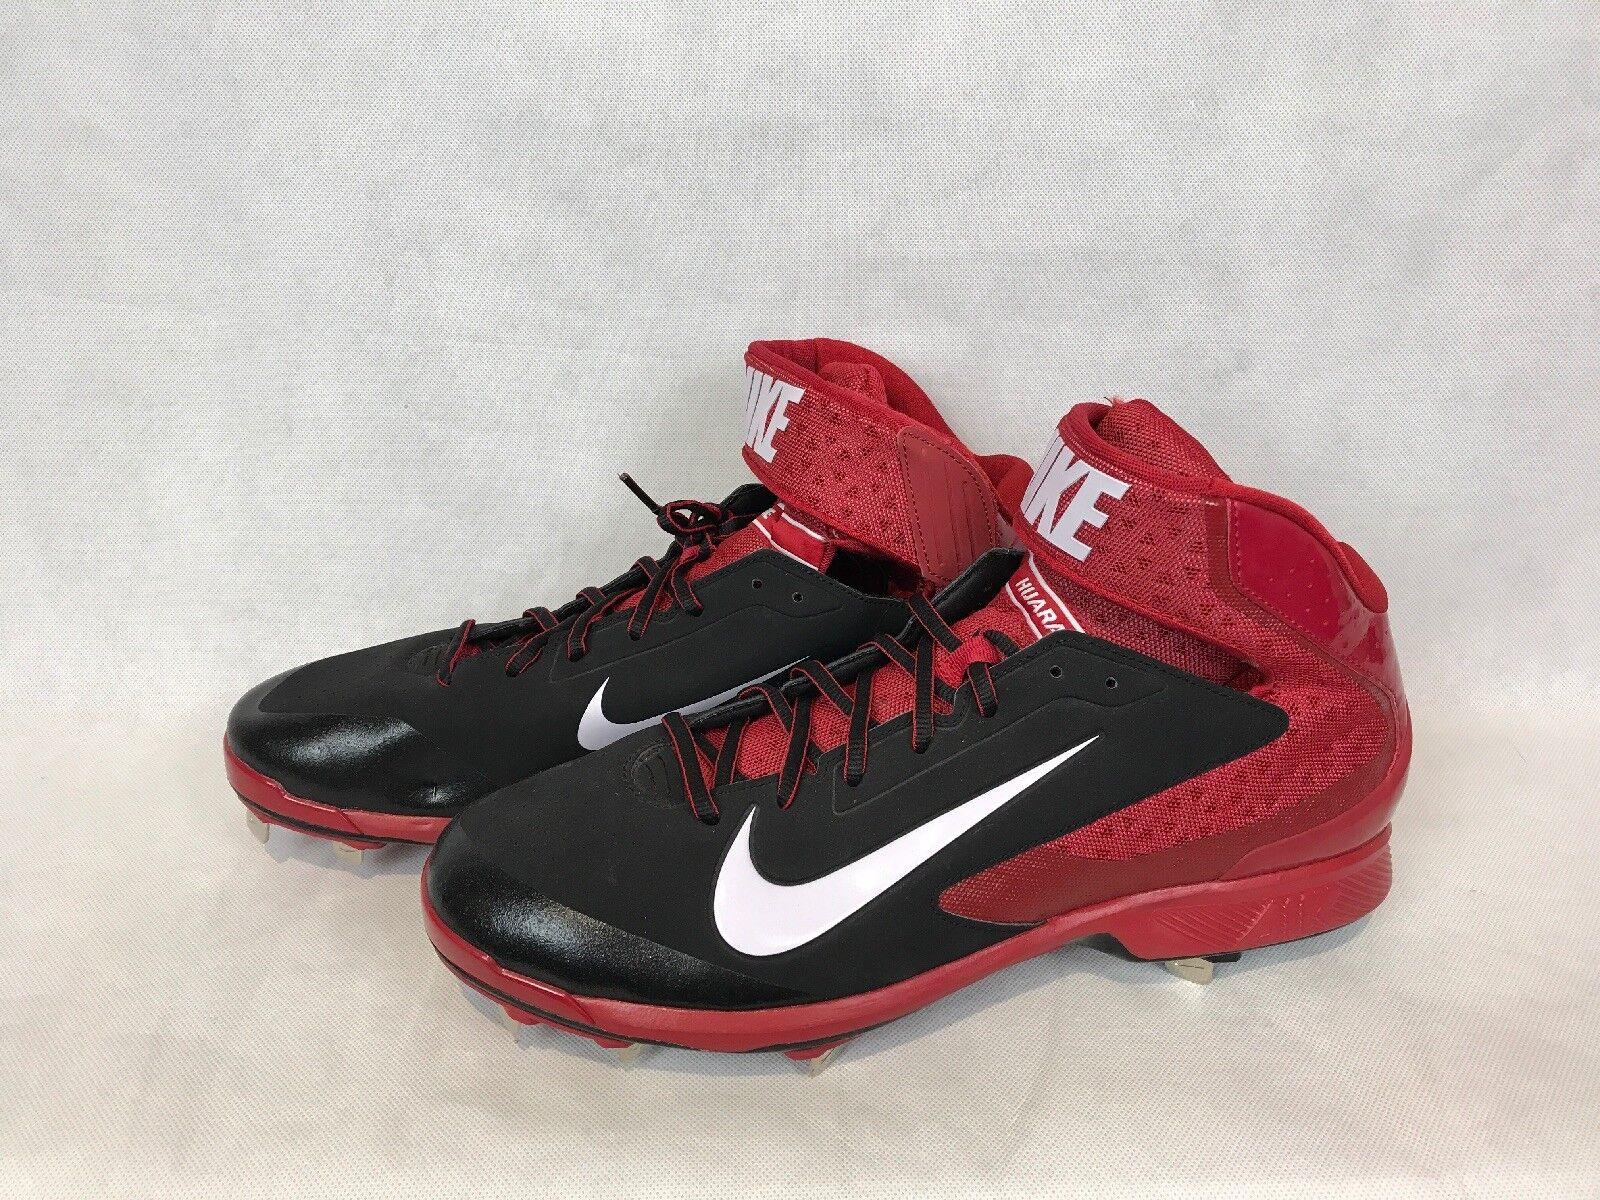 cd8448664ef3 Nike Air Huarache Pro Mid Baseball Cleats Black Red White 599235-016 ...